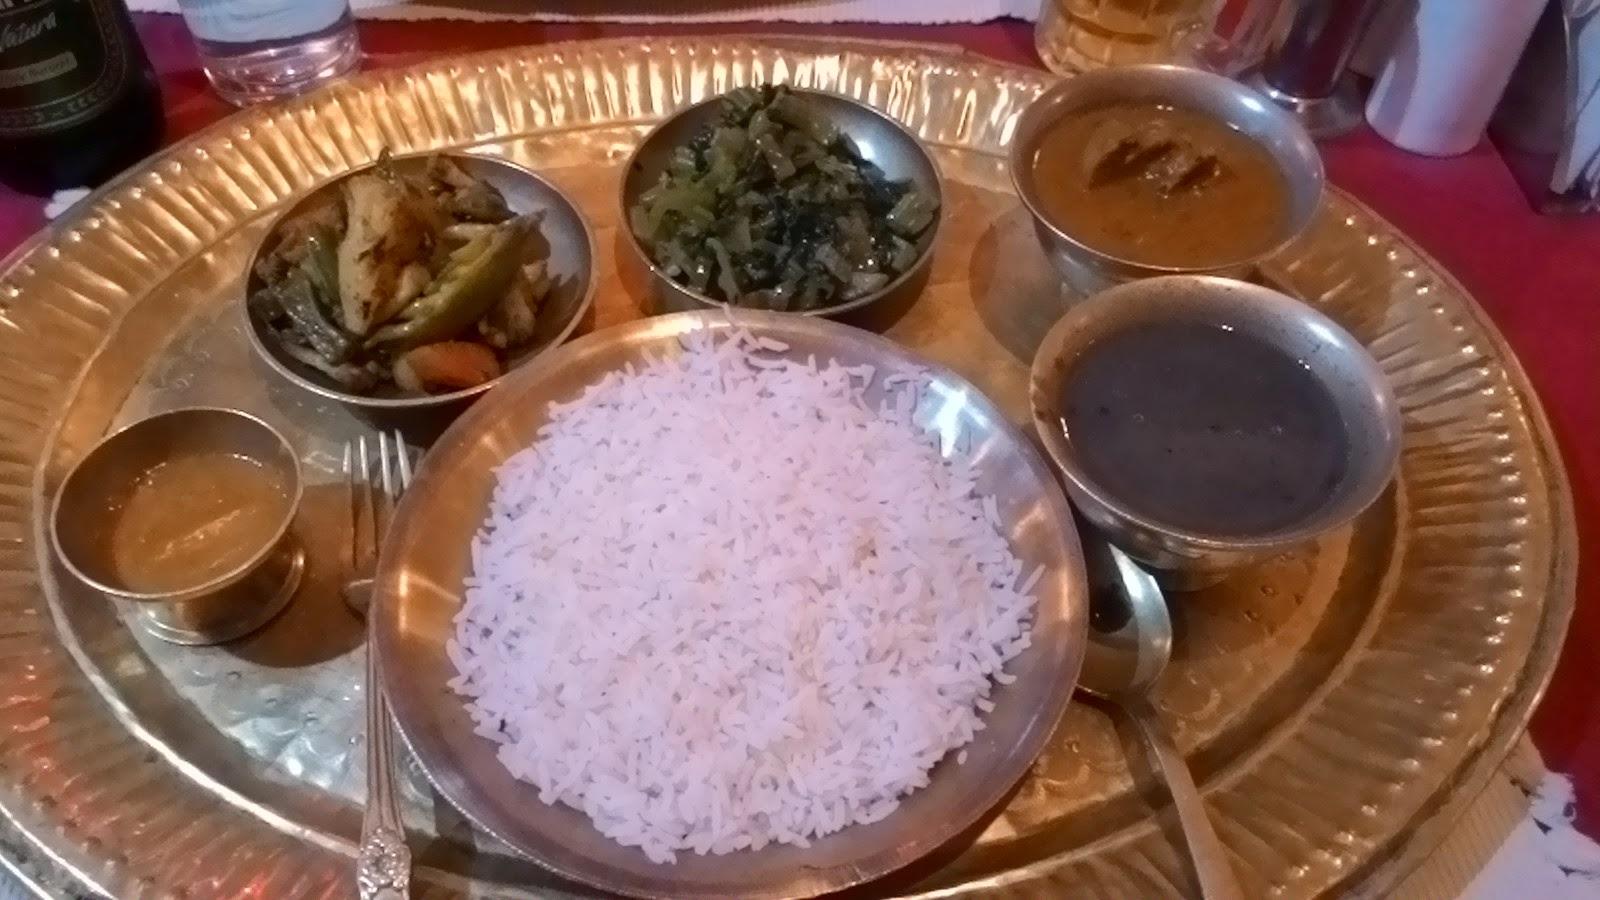 Nepali thali - Dal Bhat and Tarkari